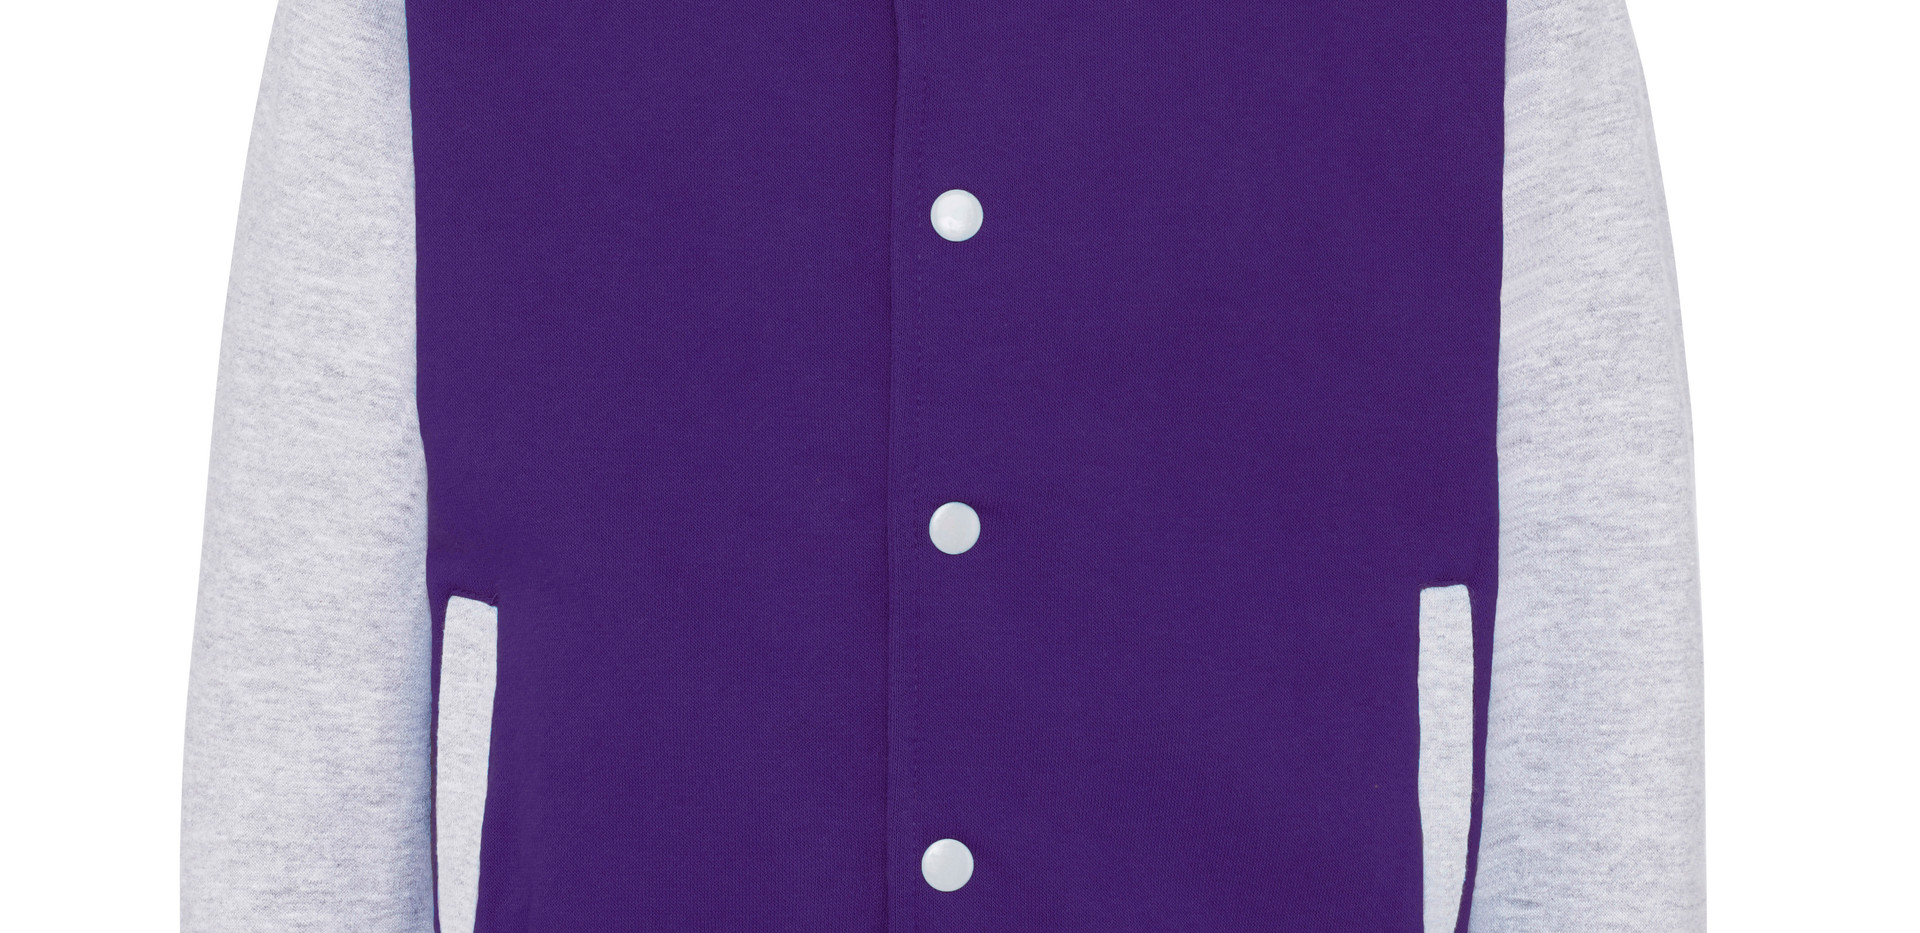 JH43J_Purple_HeatherGrey_FT.jpg